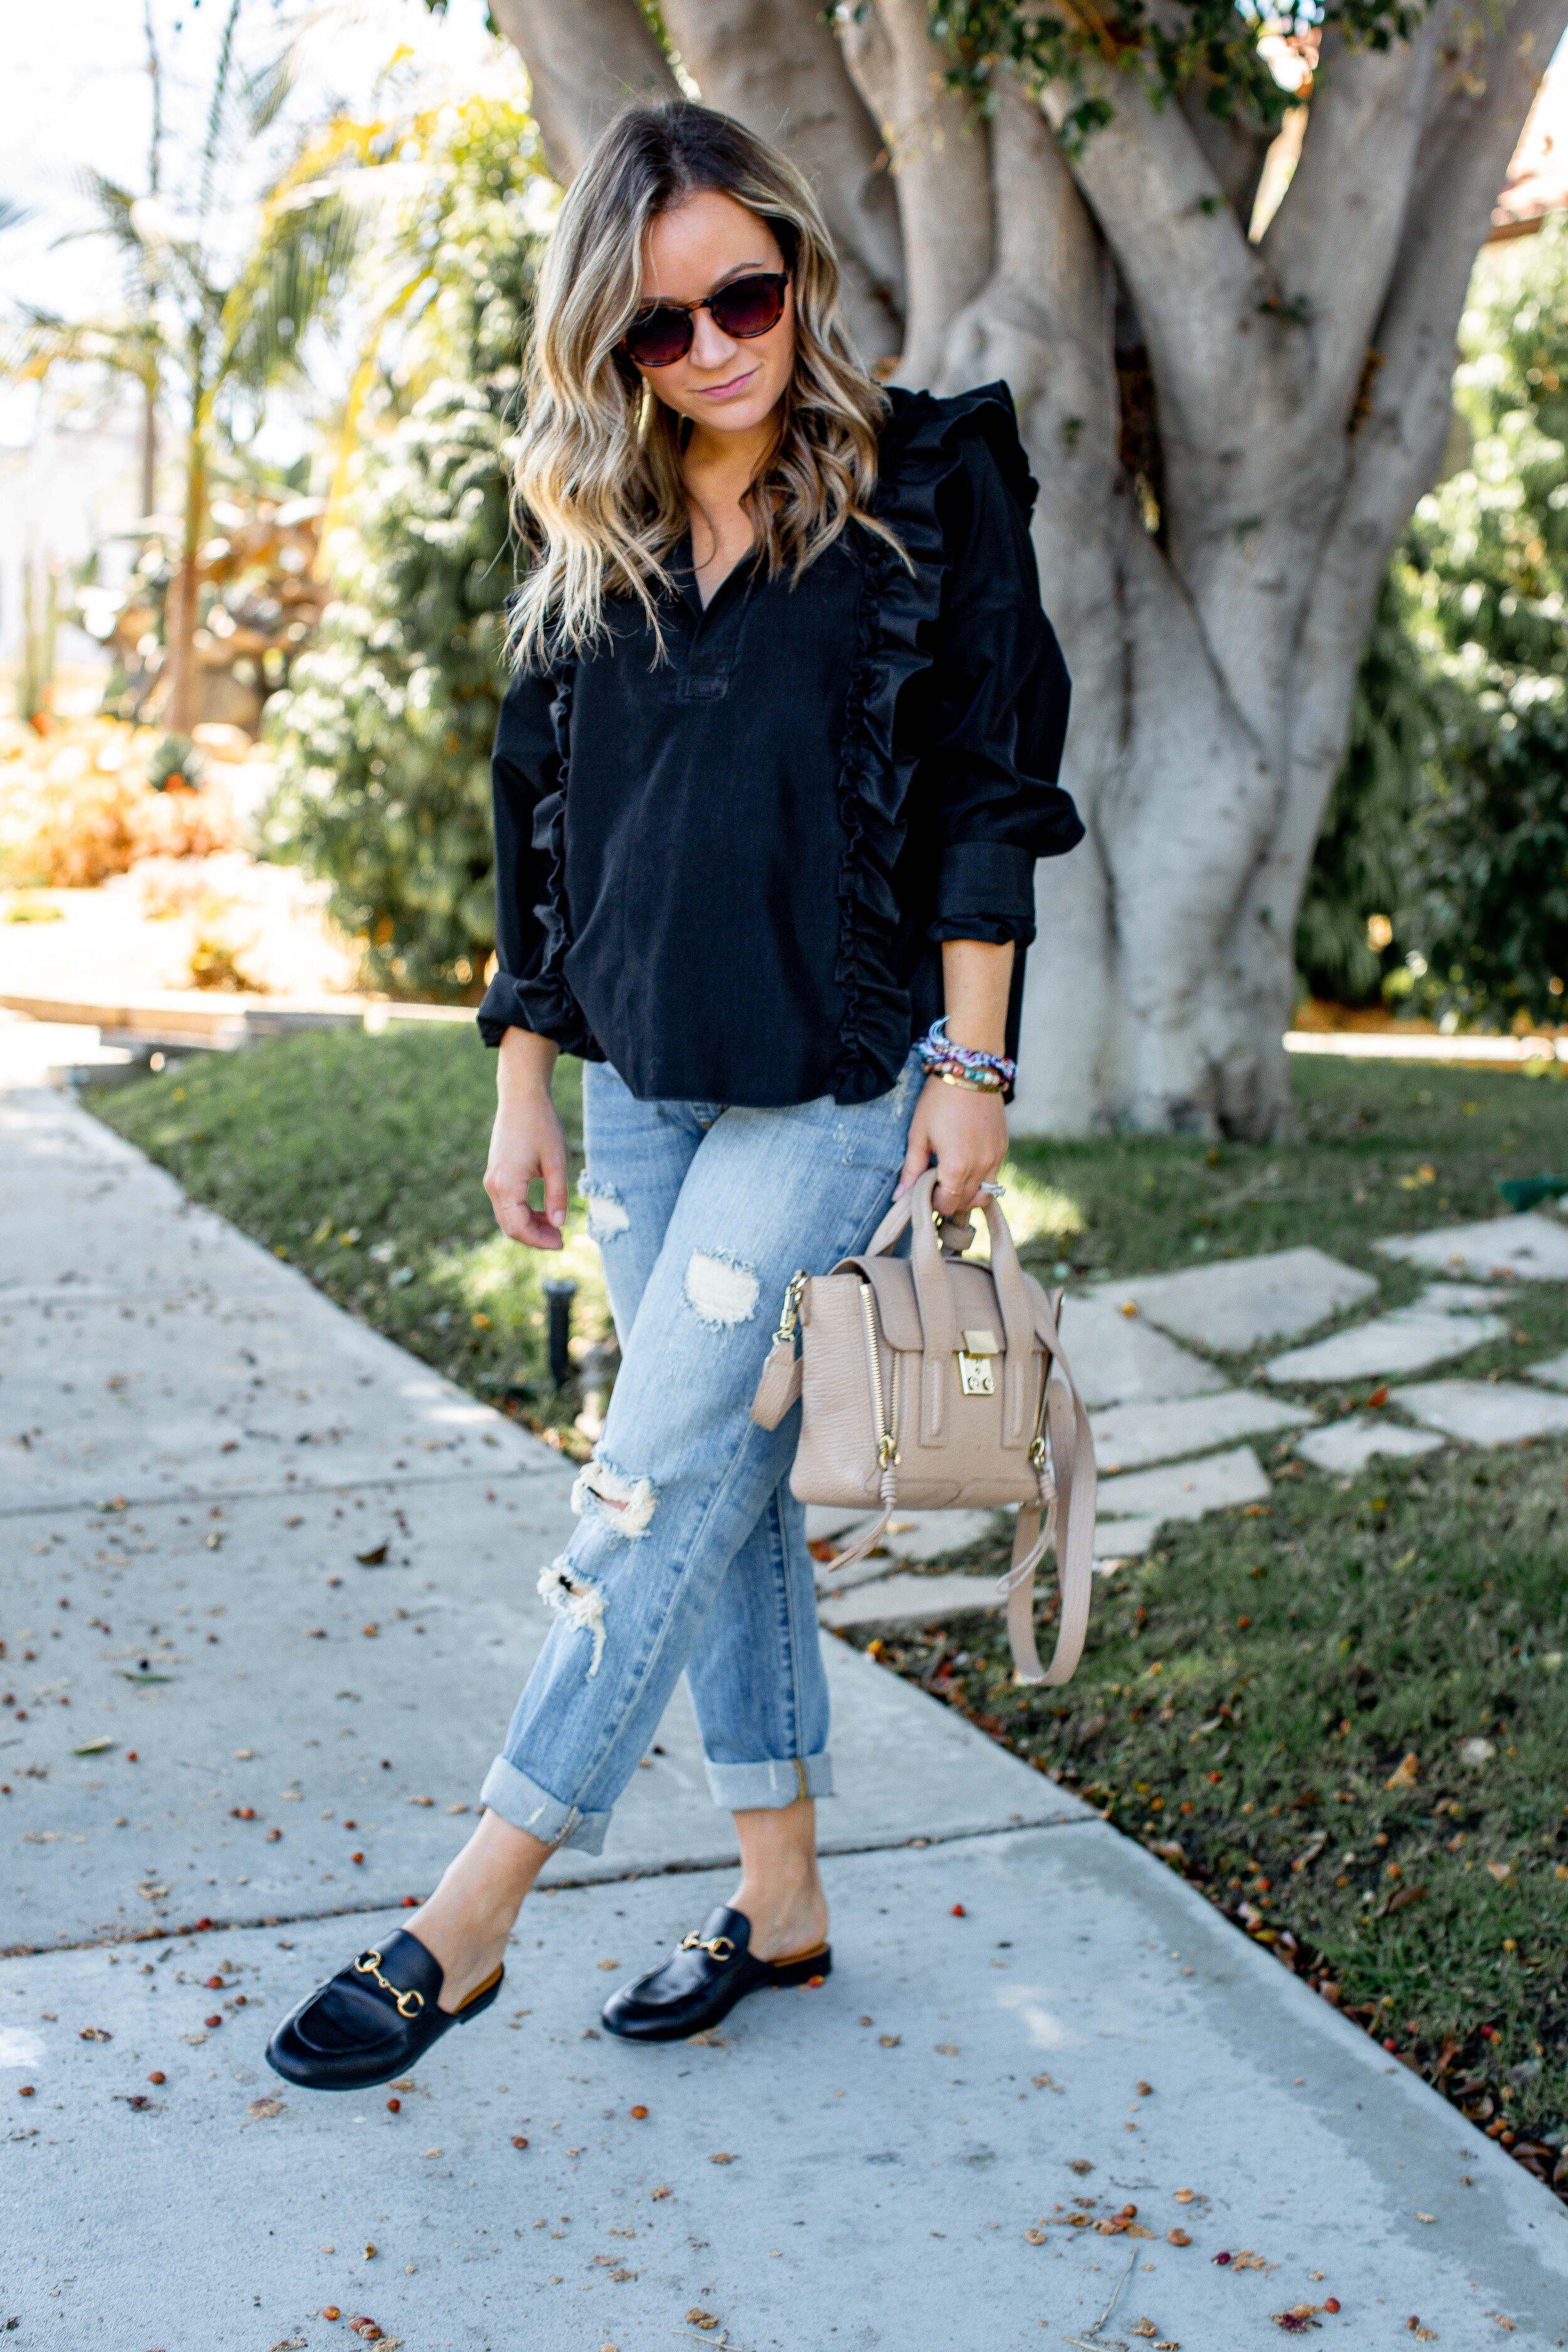 fizz-fade-bf-maternity-jeans-5.jpg